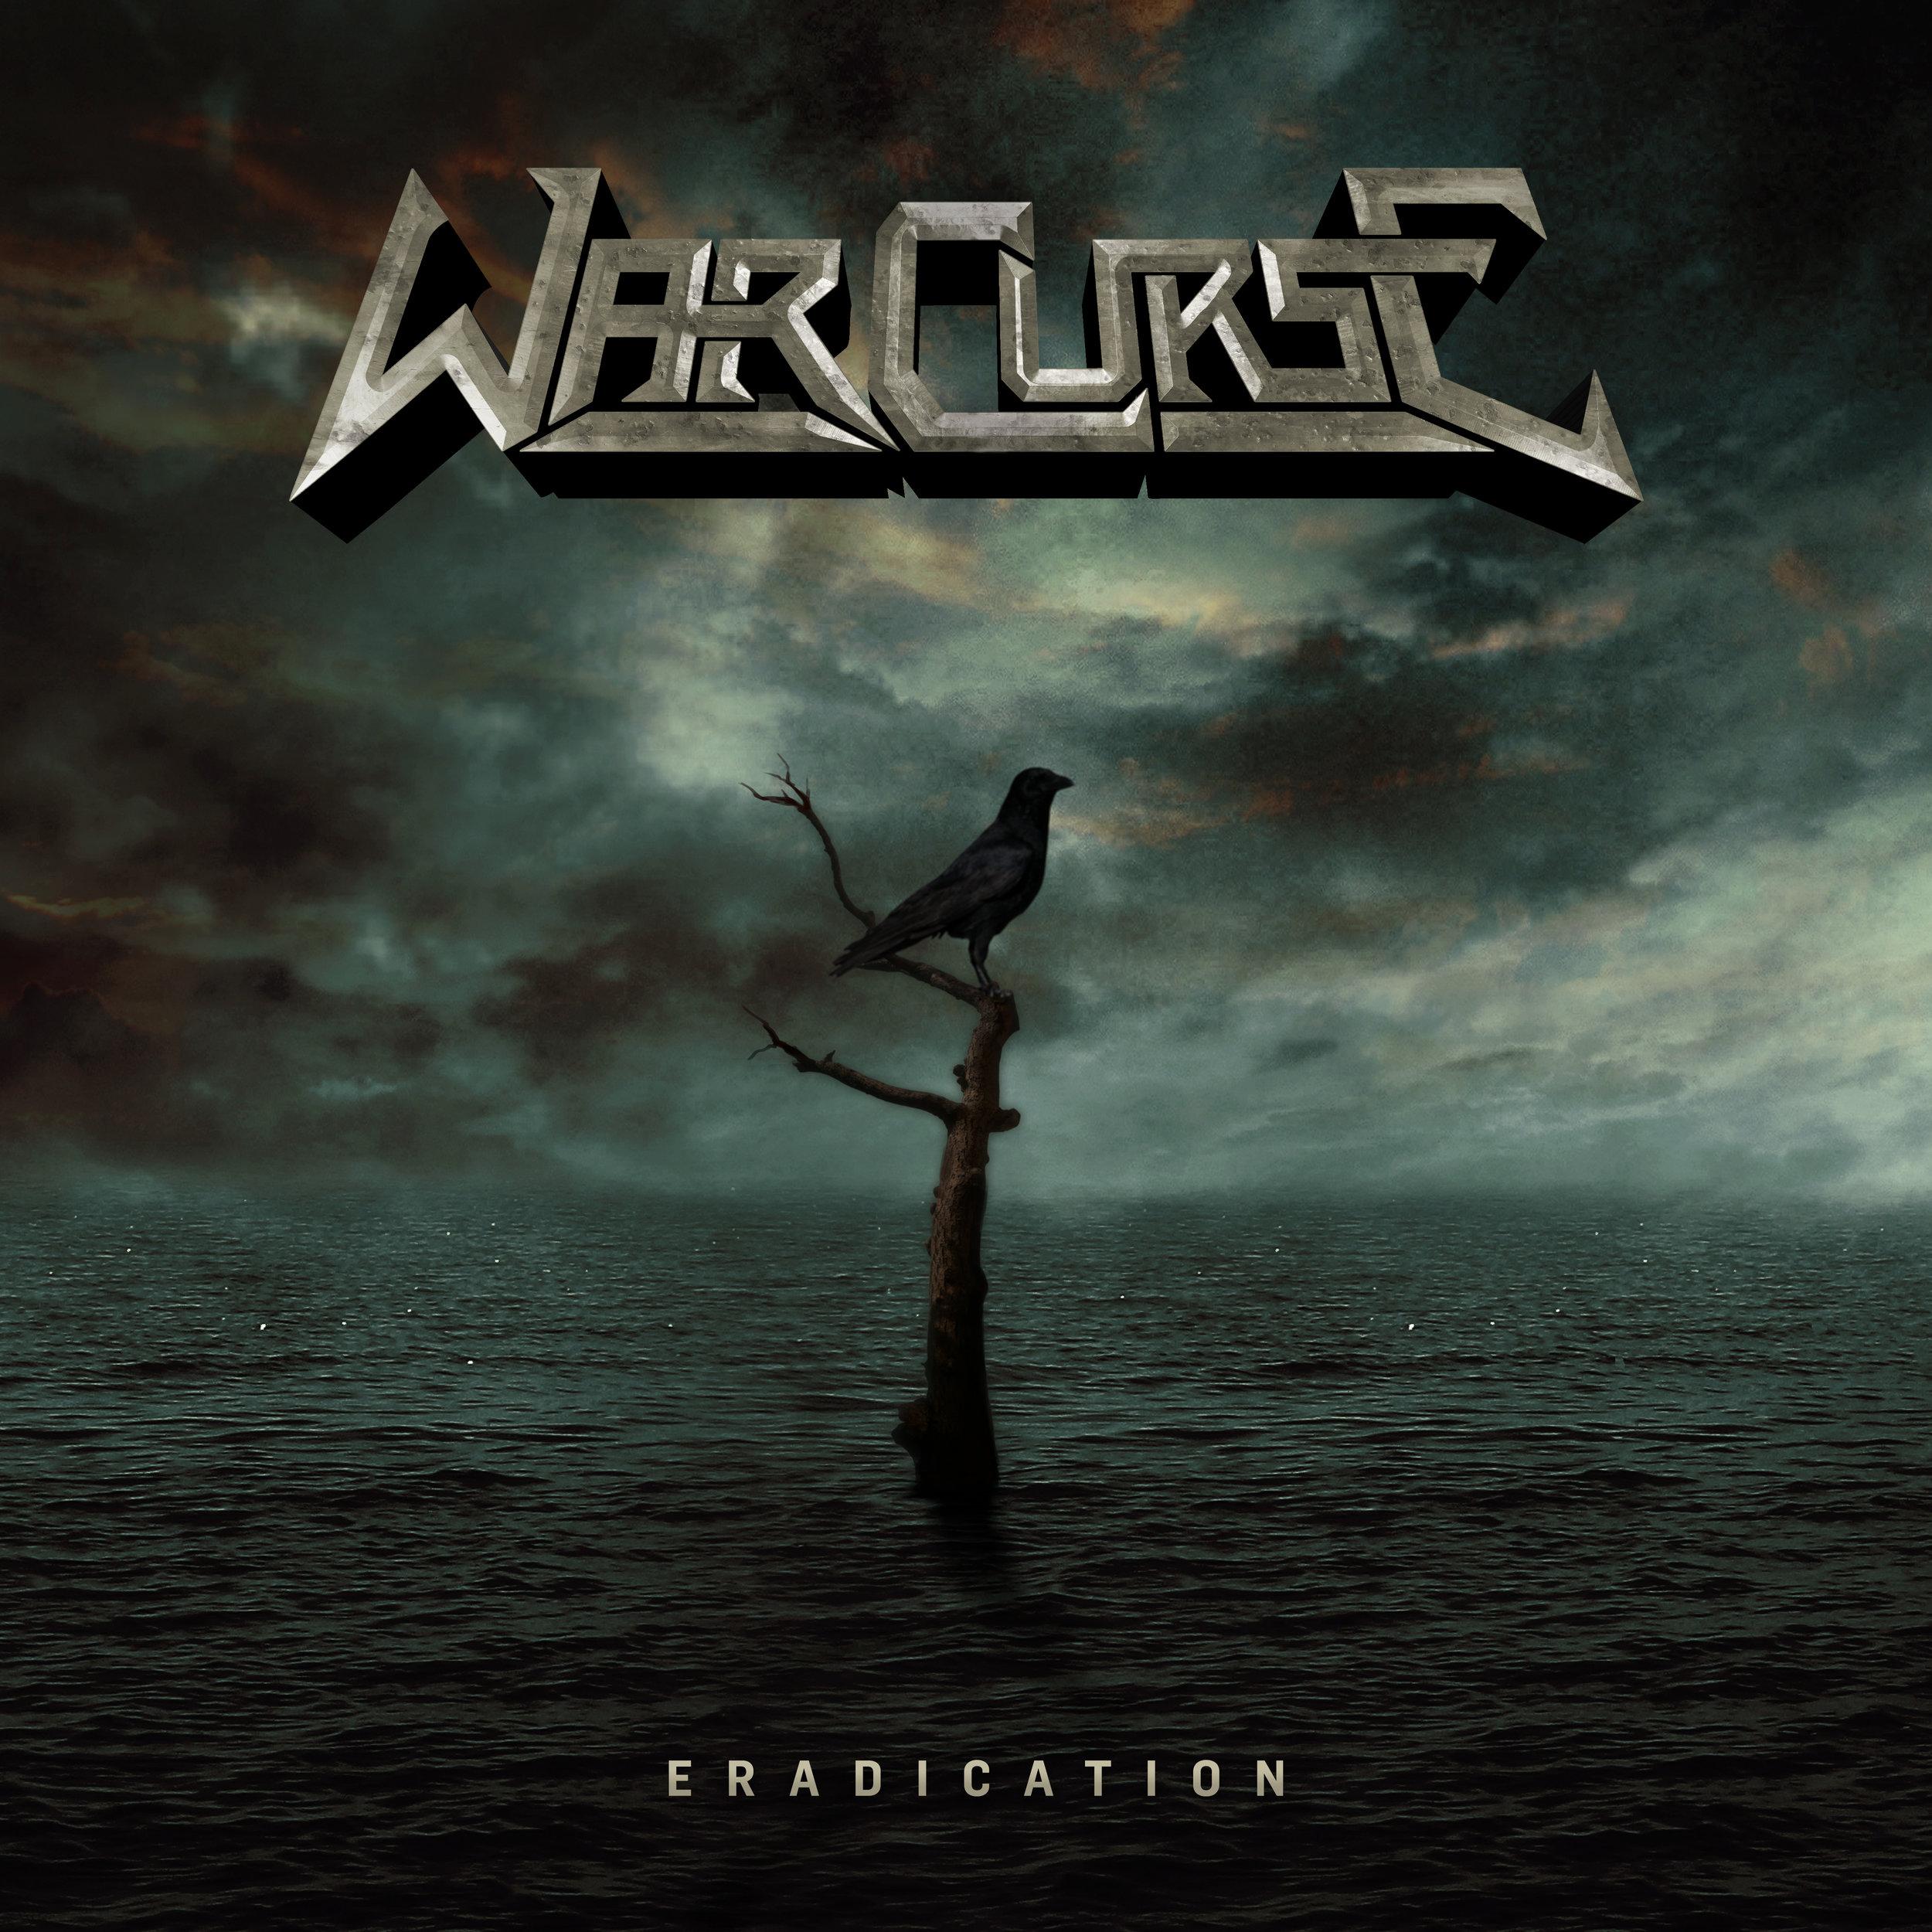 War_Curse_Eradication_Cover.jpg